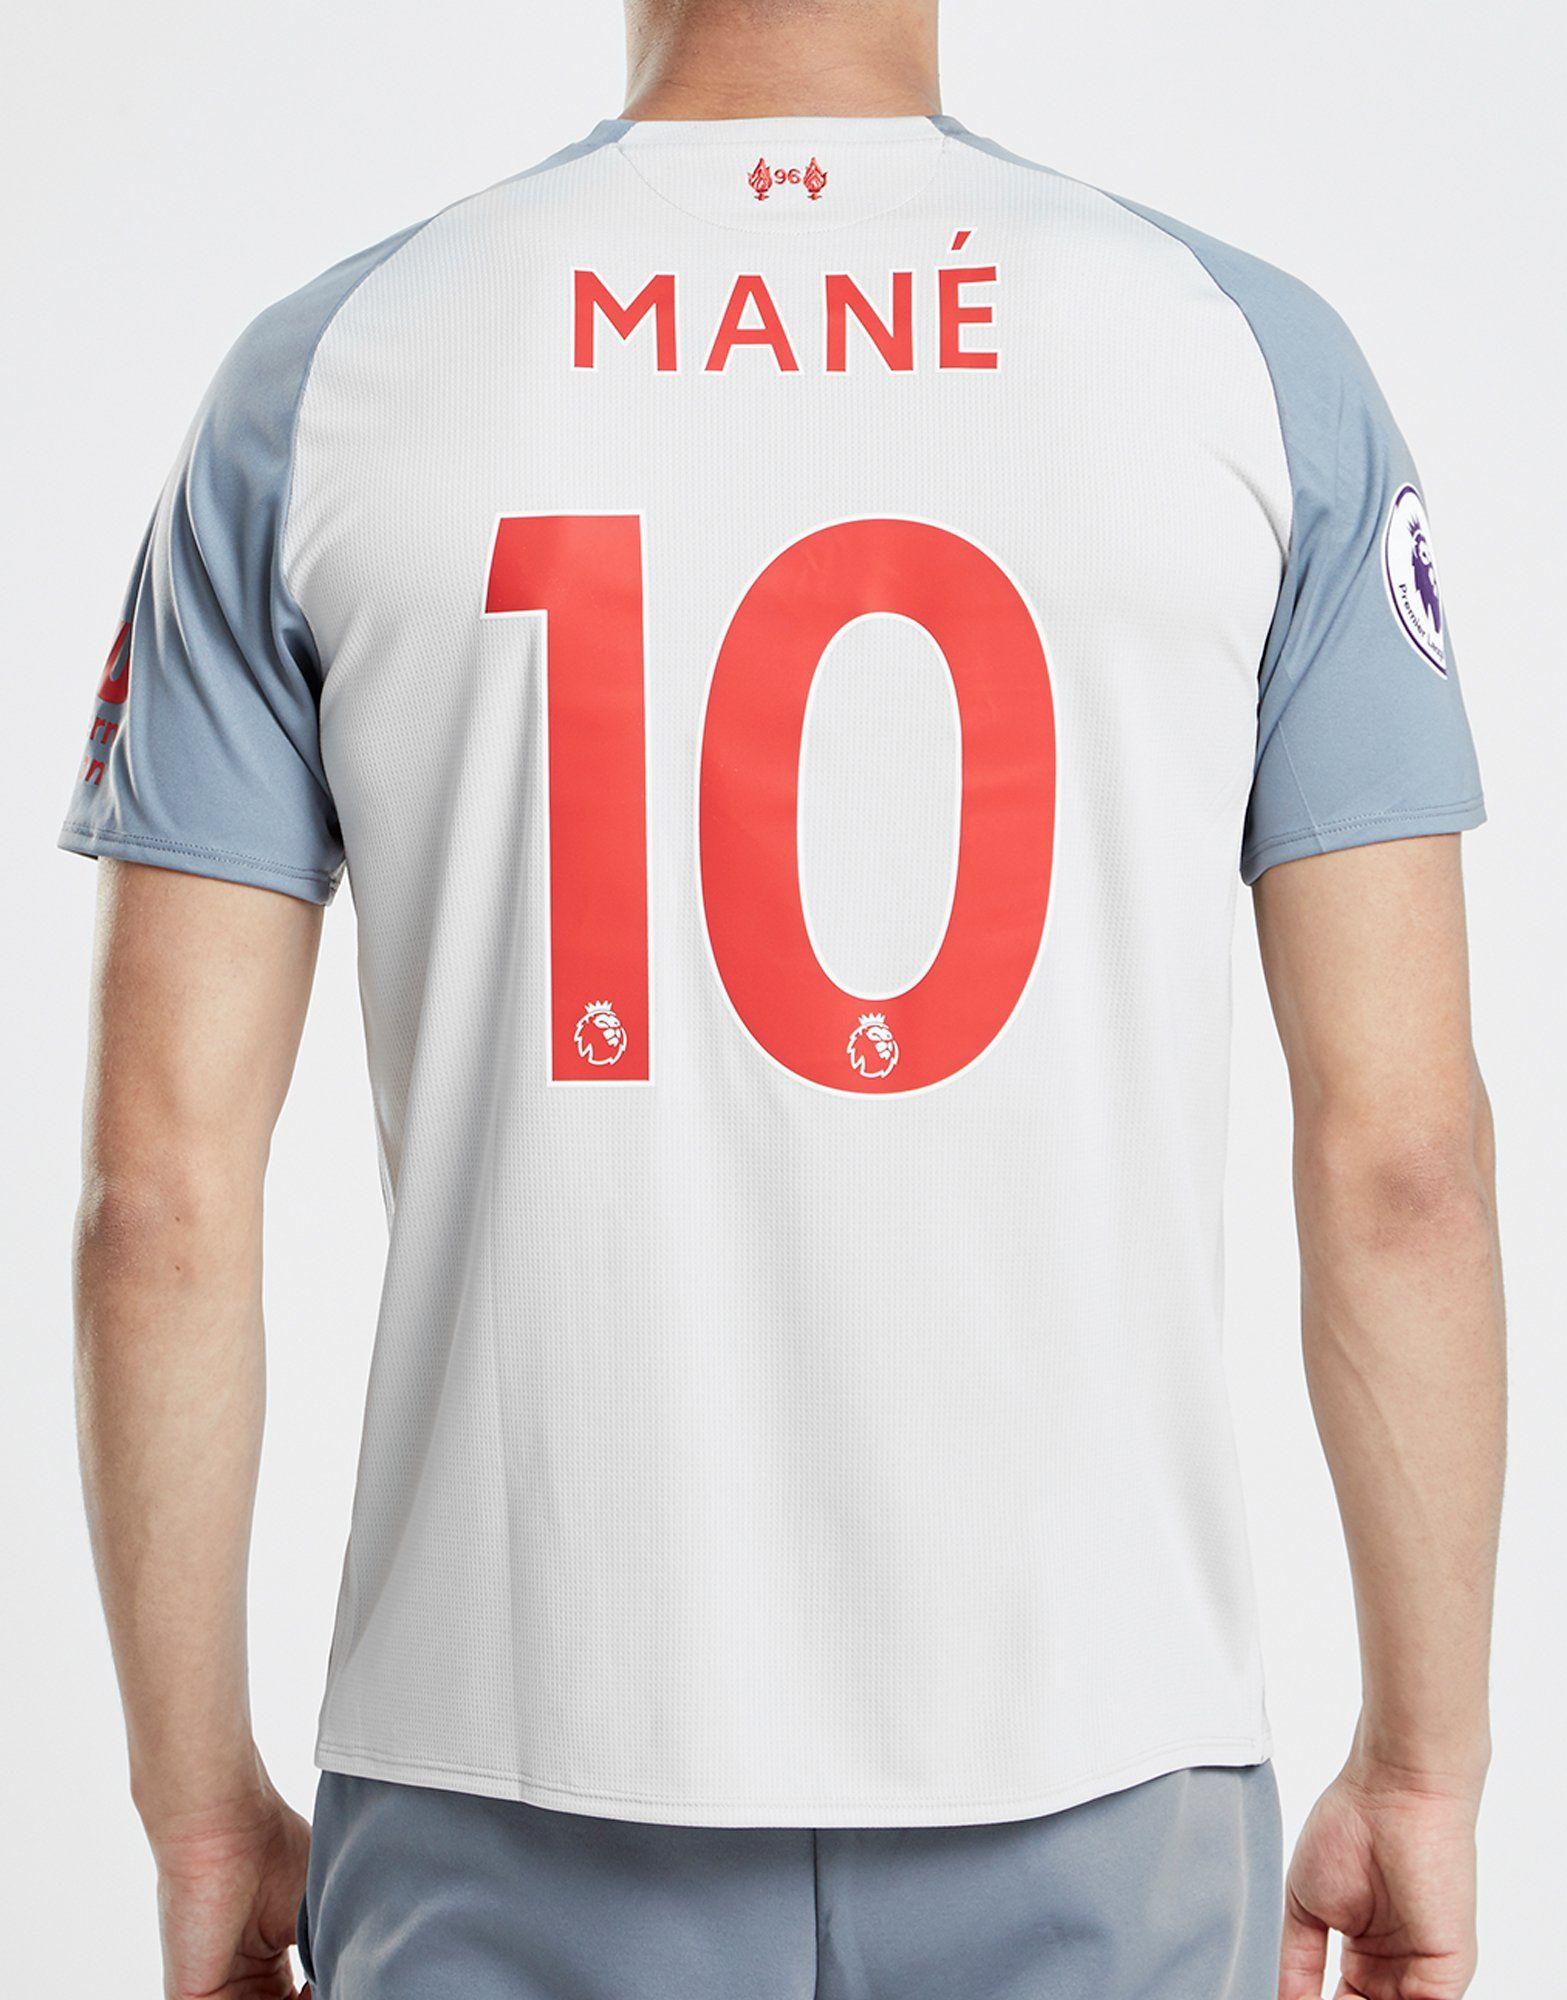 New Balance Liverpool FC 2018/19 Mane #10 Third Shirt